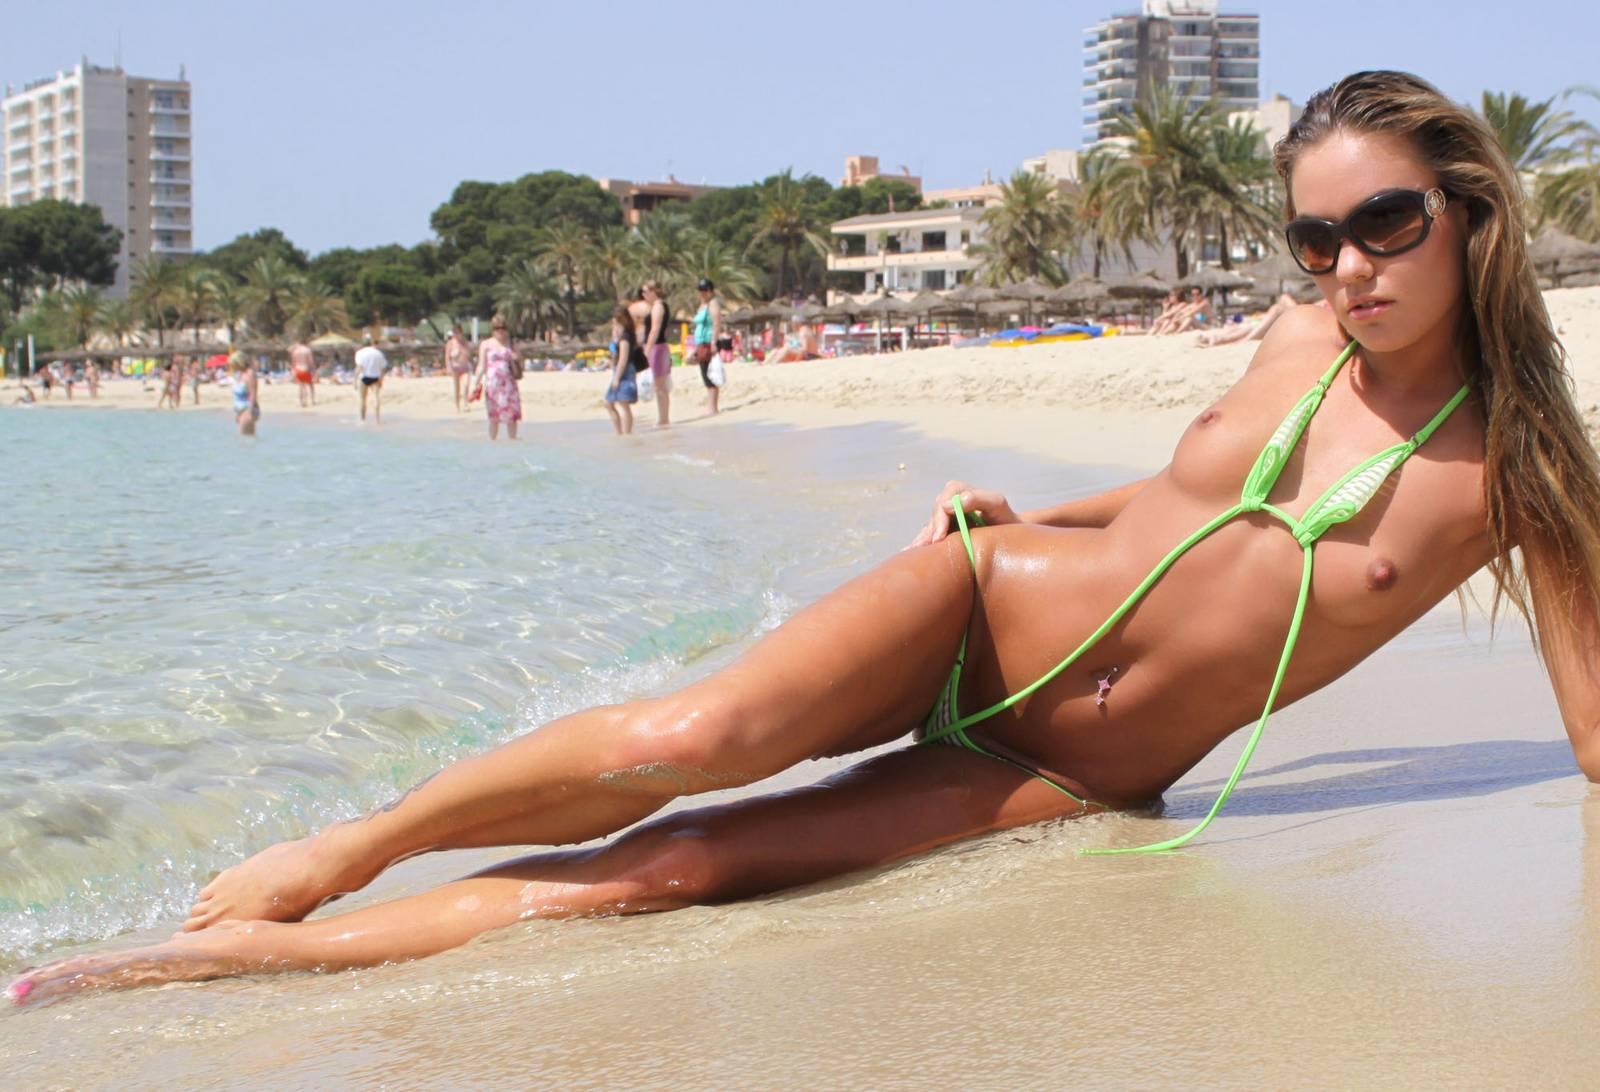 Beach bikini strangers micro topless hidden